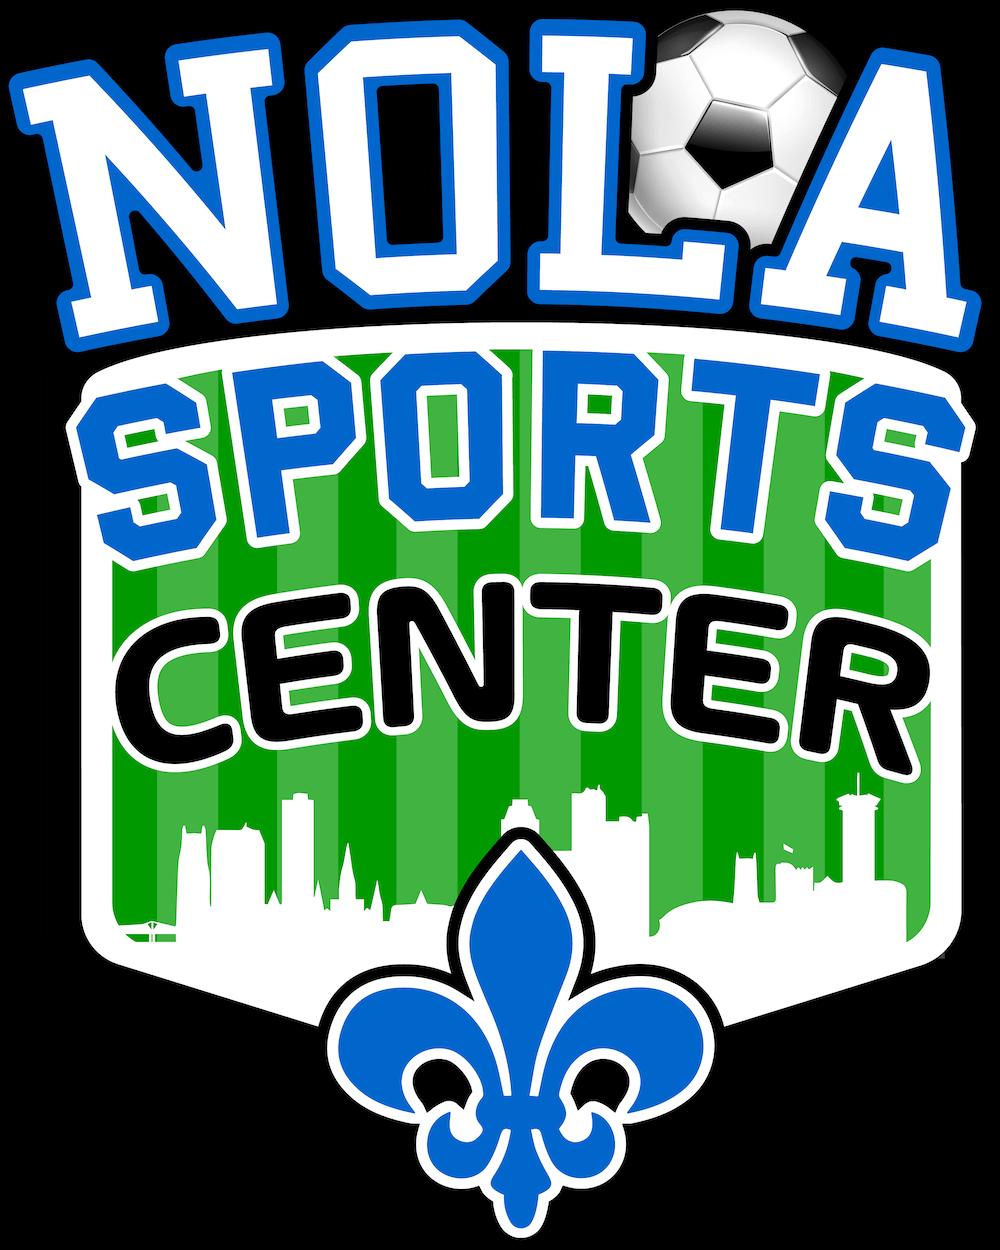 NOLA Sports Center